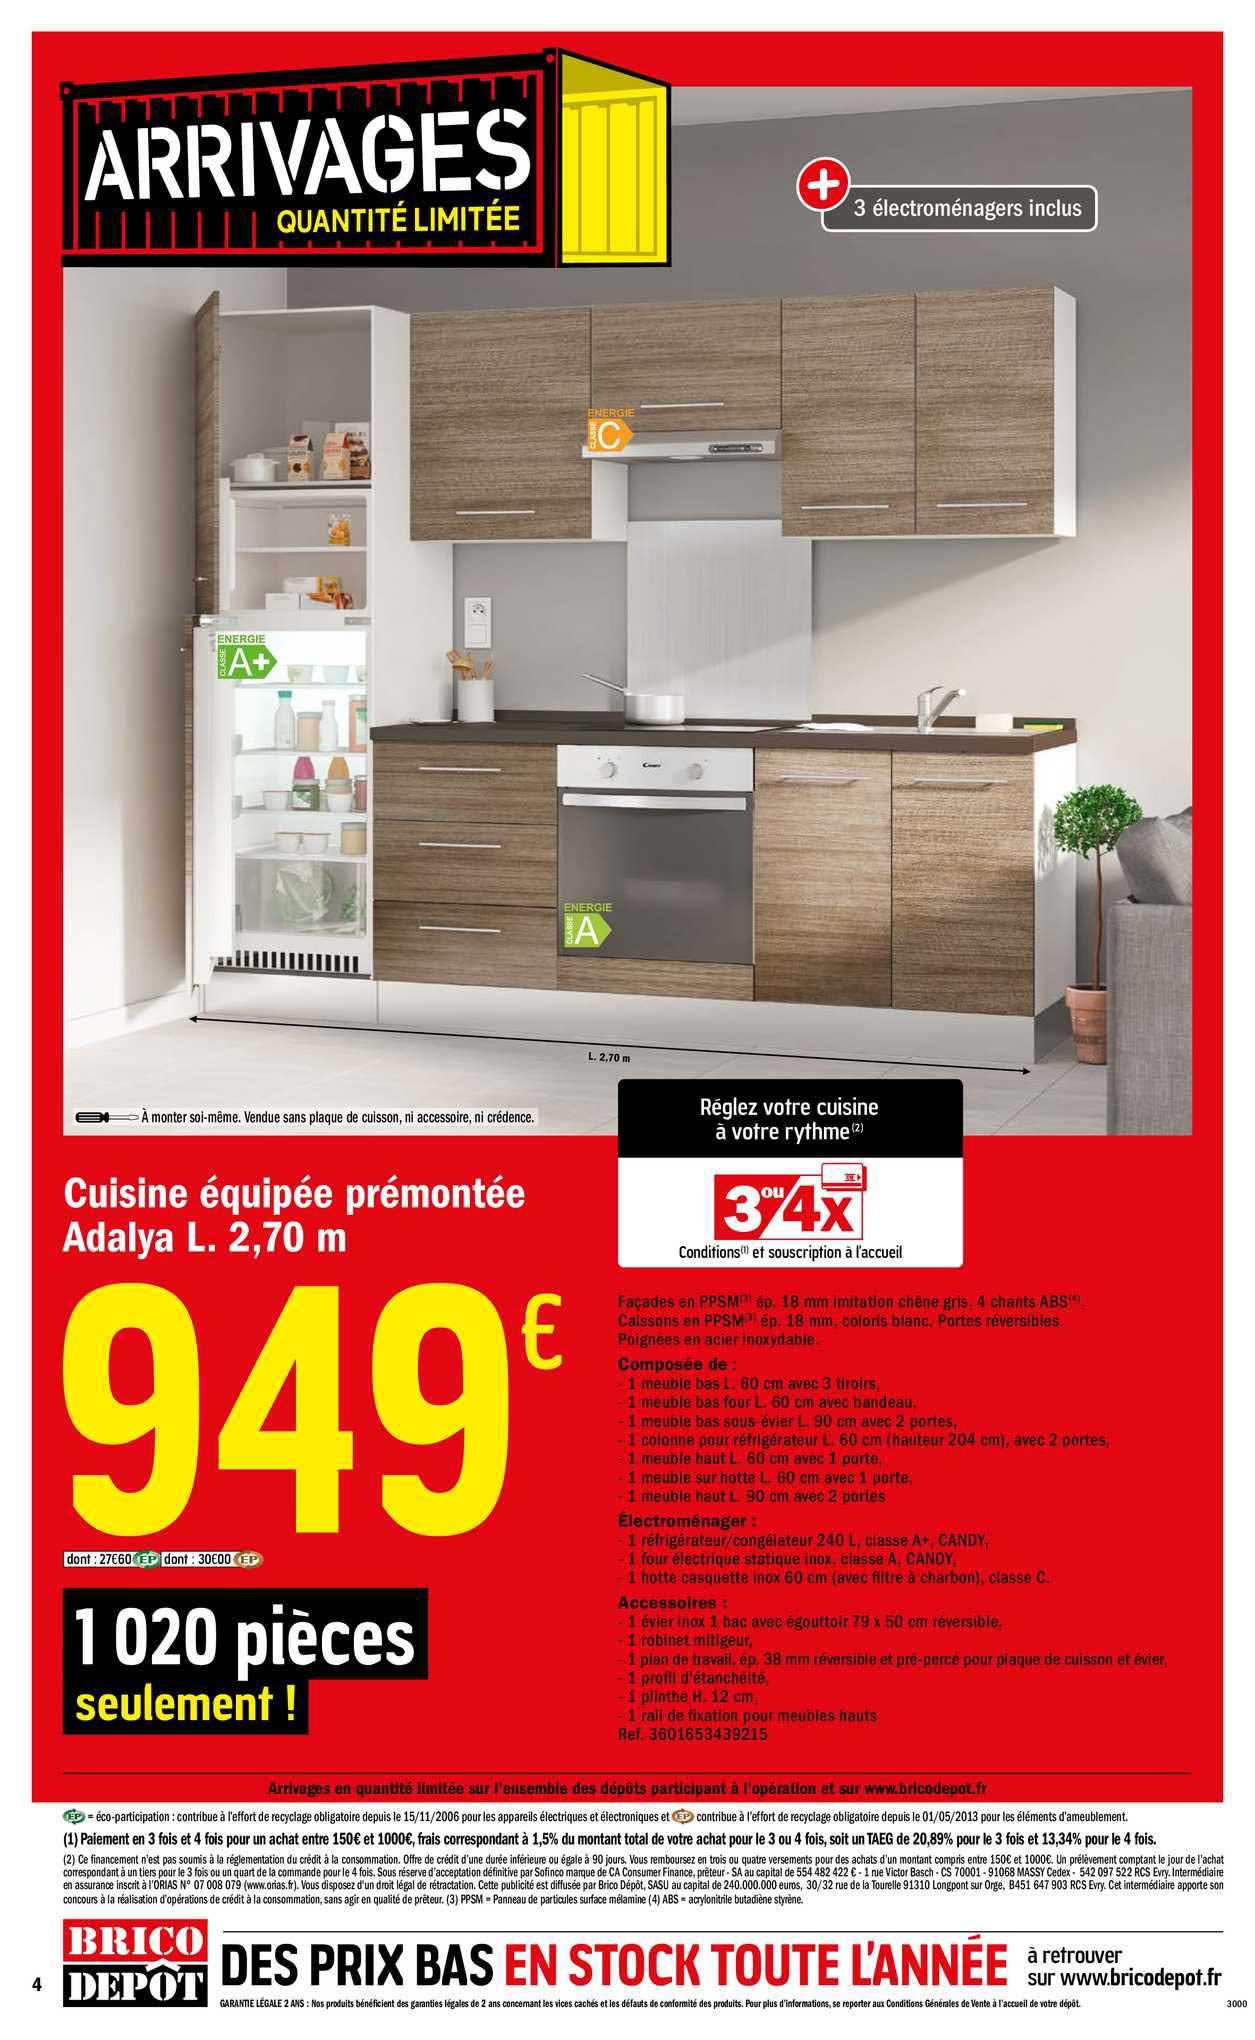 Offre Cuisine Equipee Premontee Adalya L 2 70m Chez Brico Depot